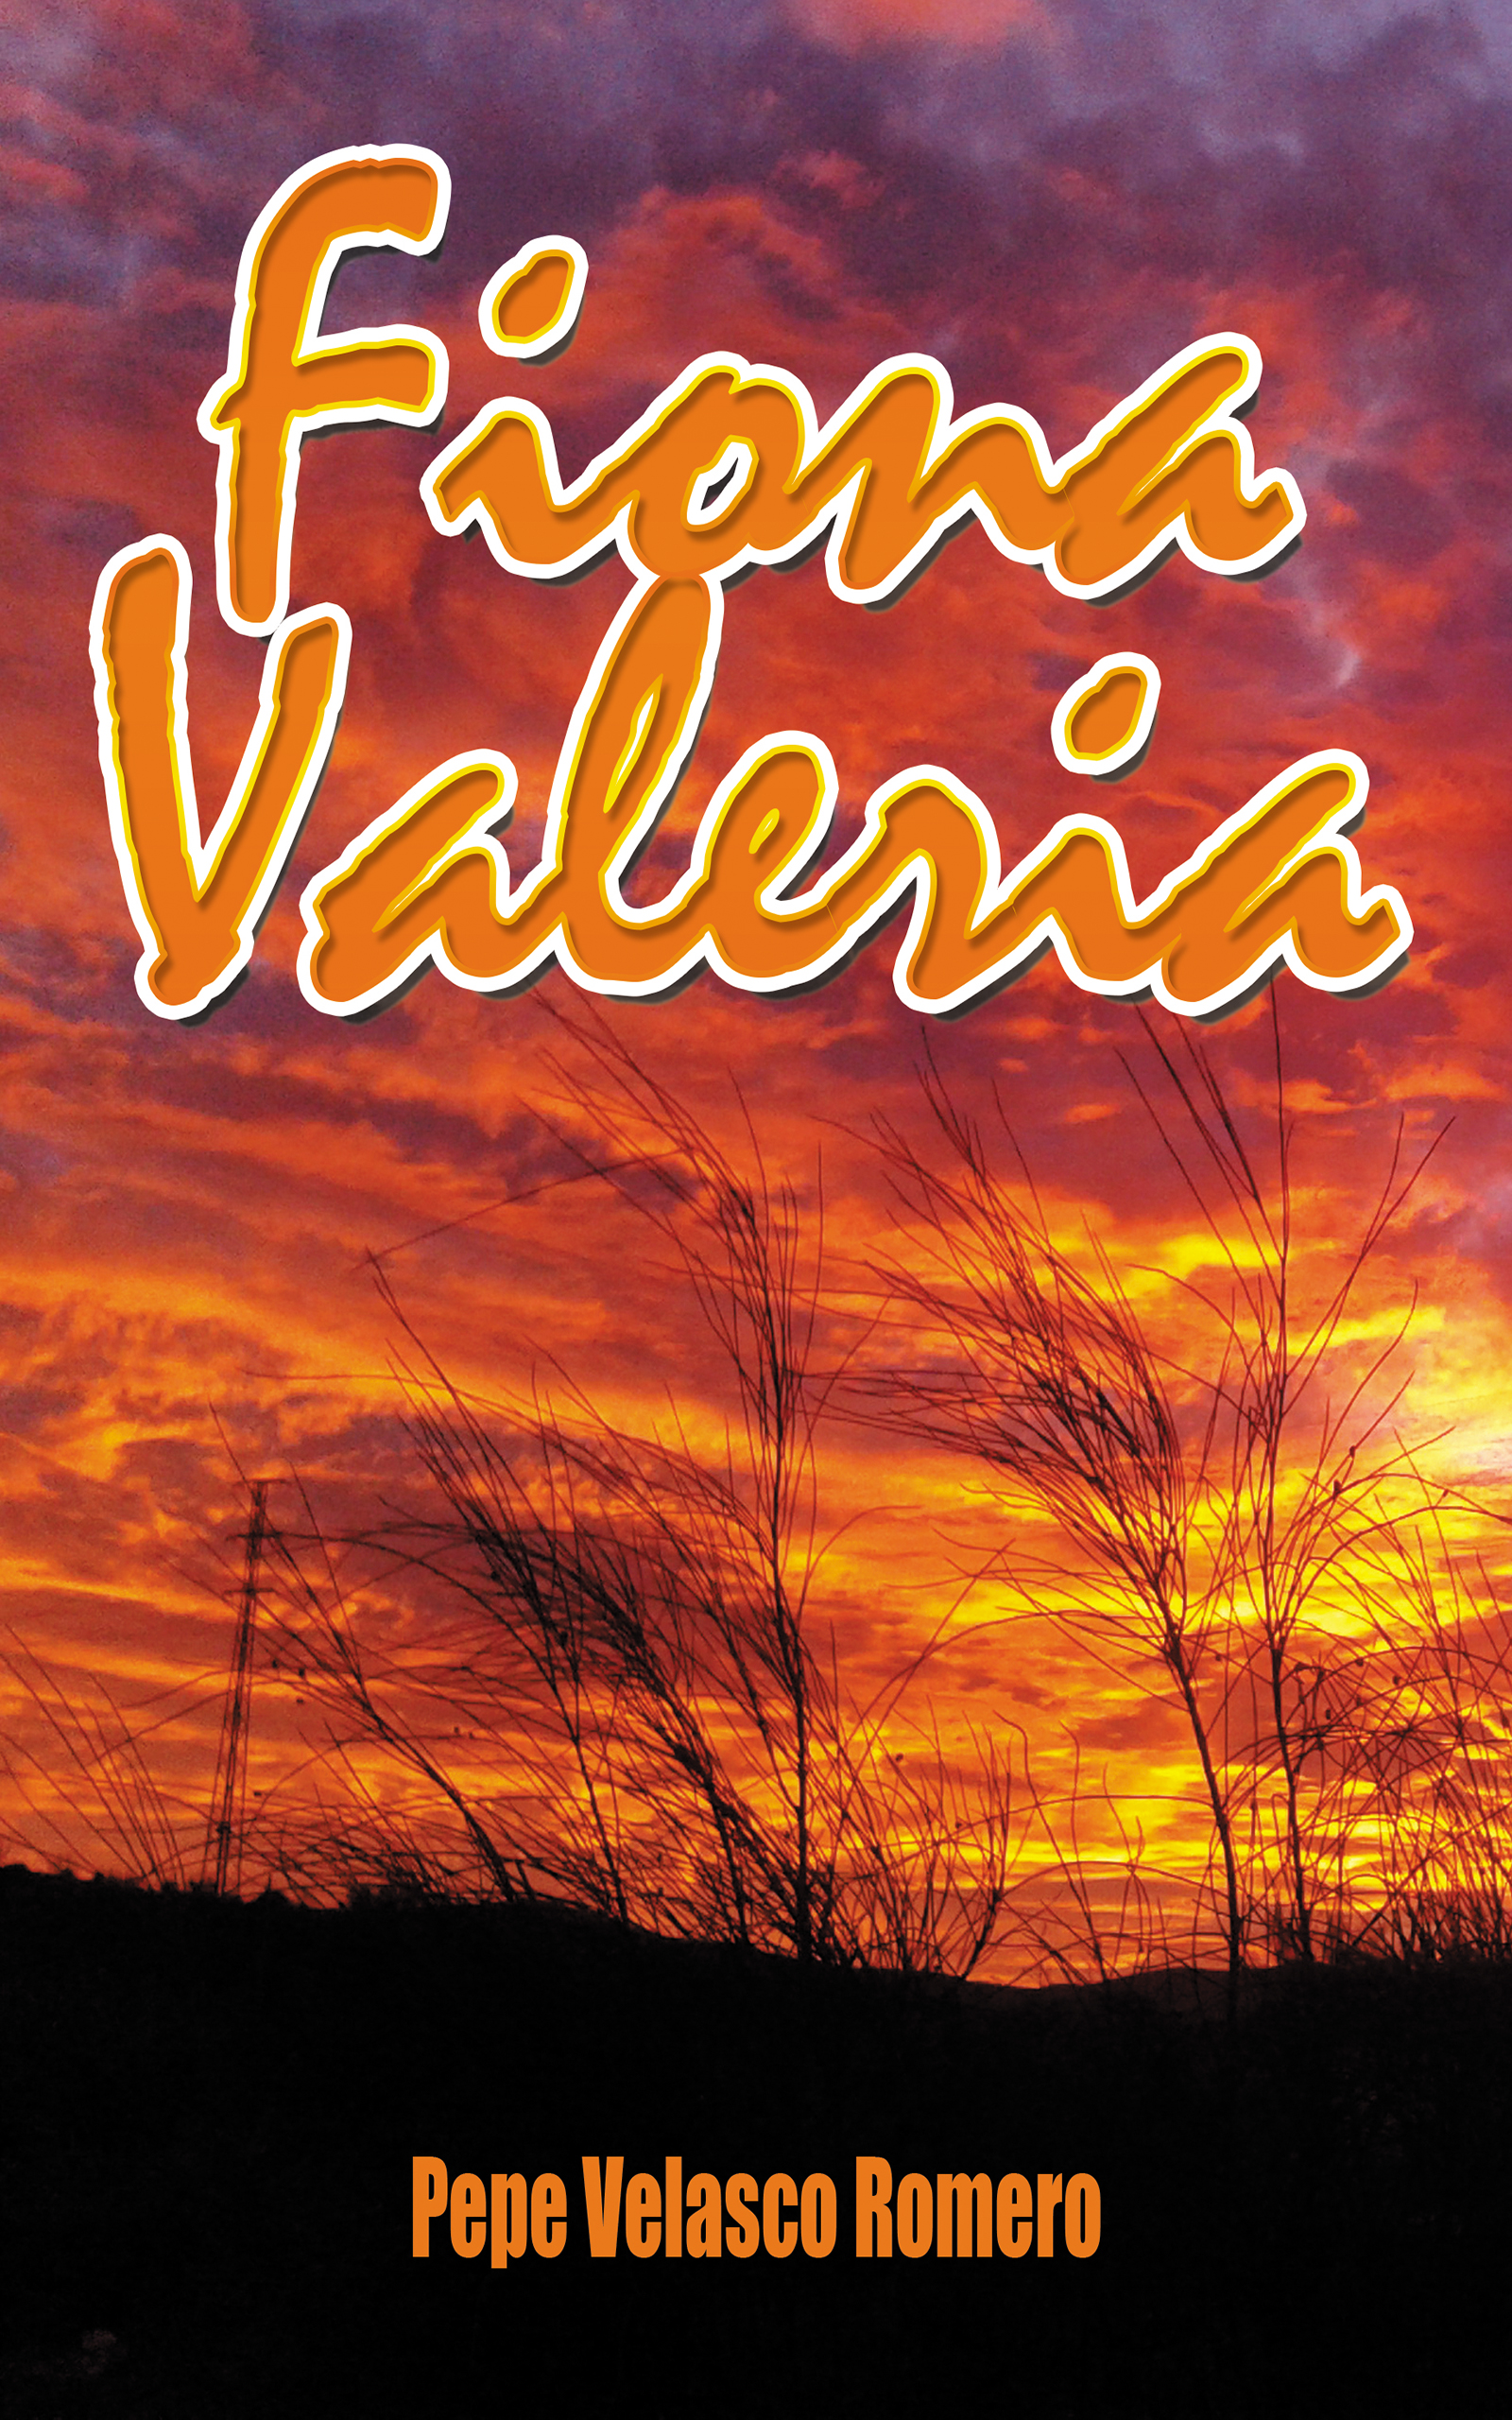 Portada EBook Fiona Valeria PEPE VELASCO